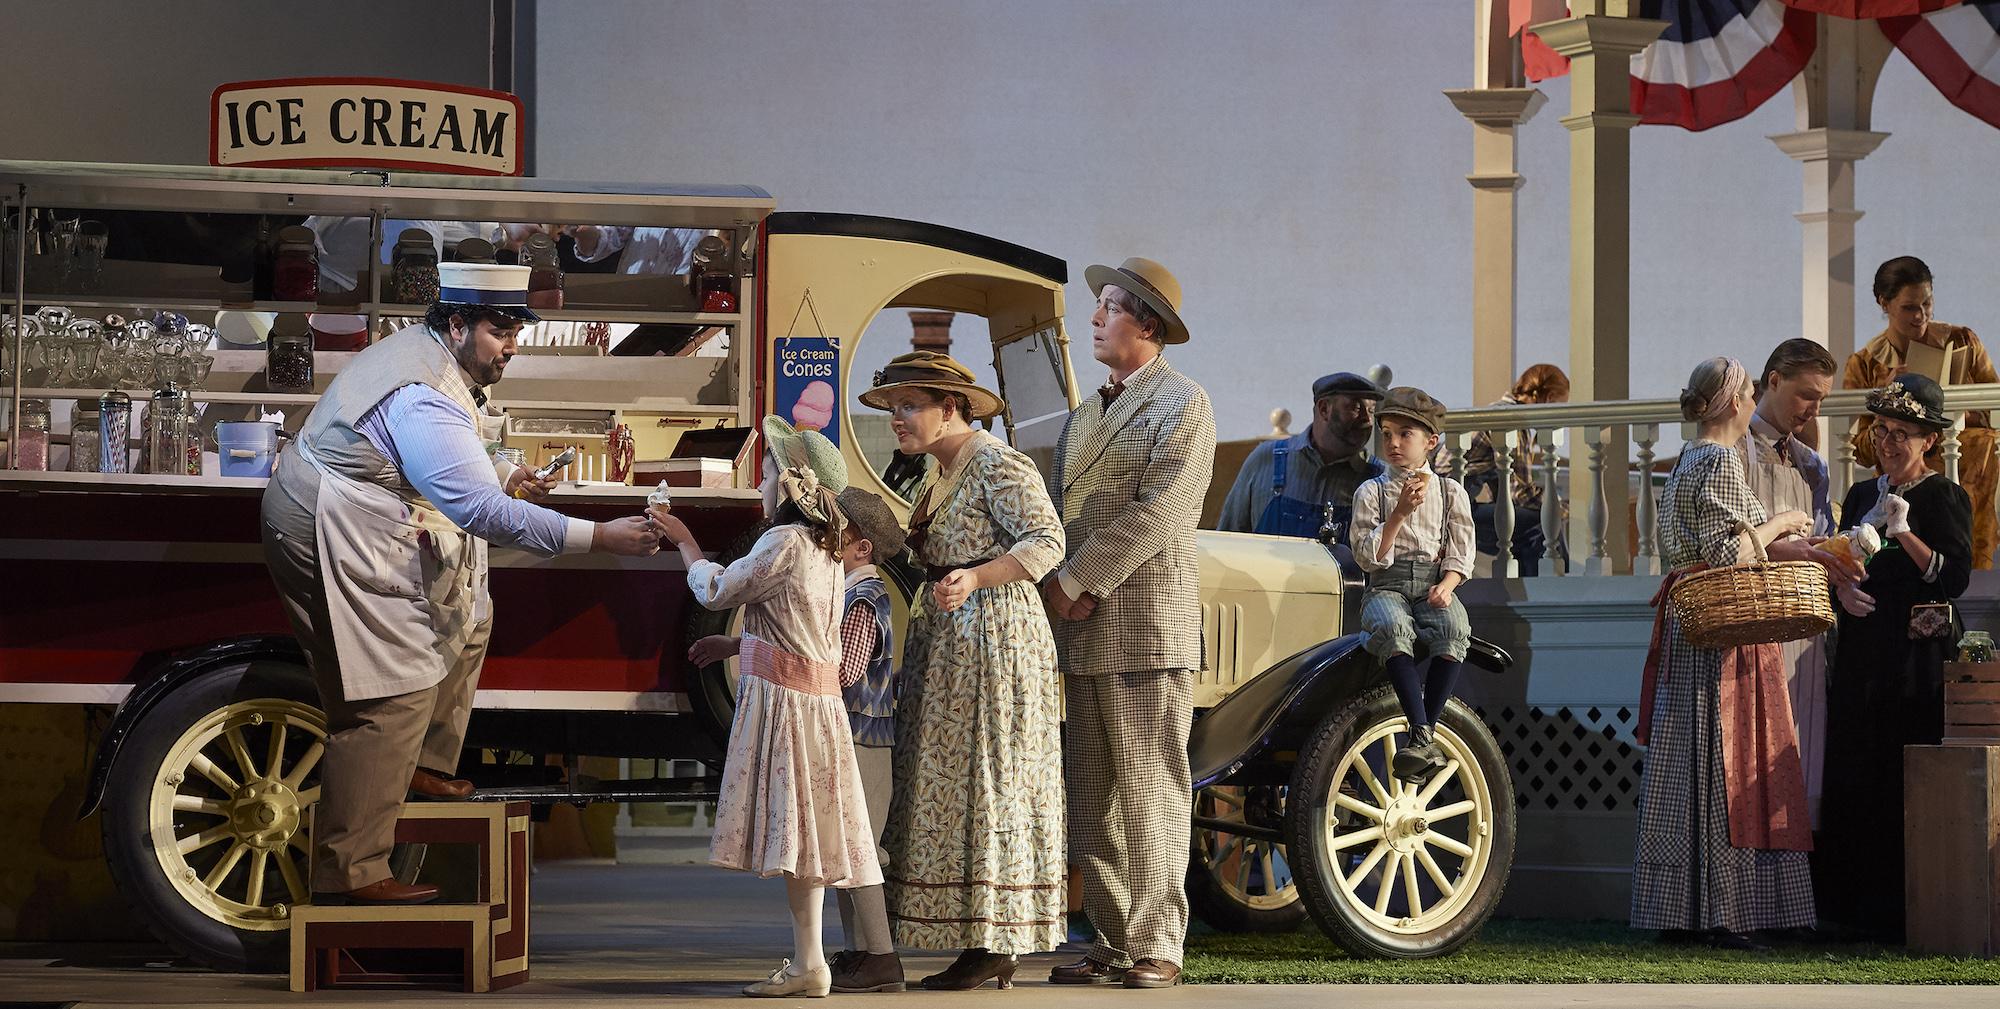 Vancouver Opera presents Donizetti'sL'Elisir d'amore(The Elixir of Love)